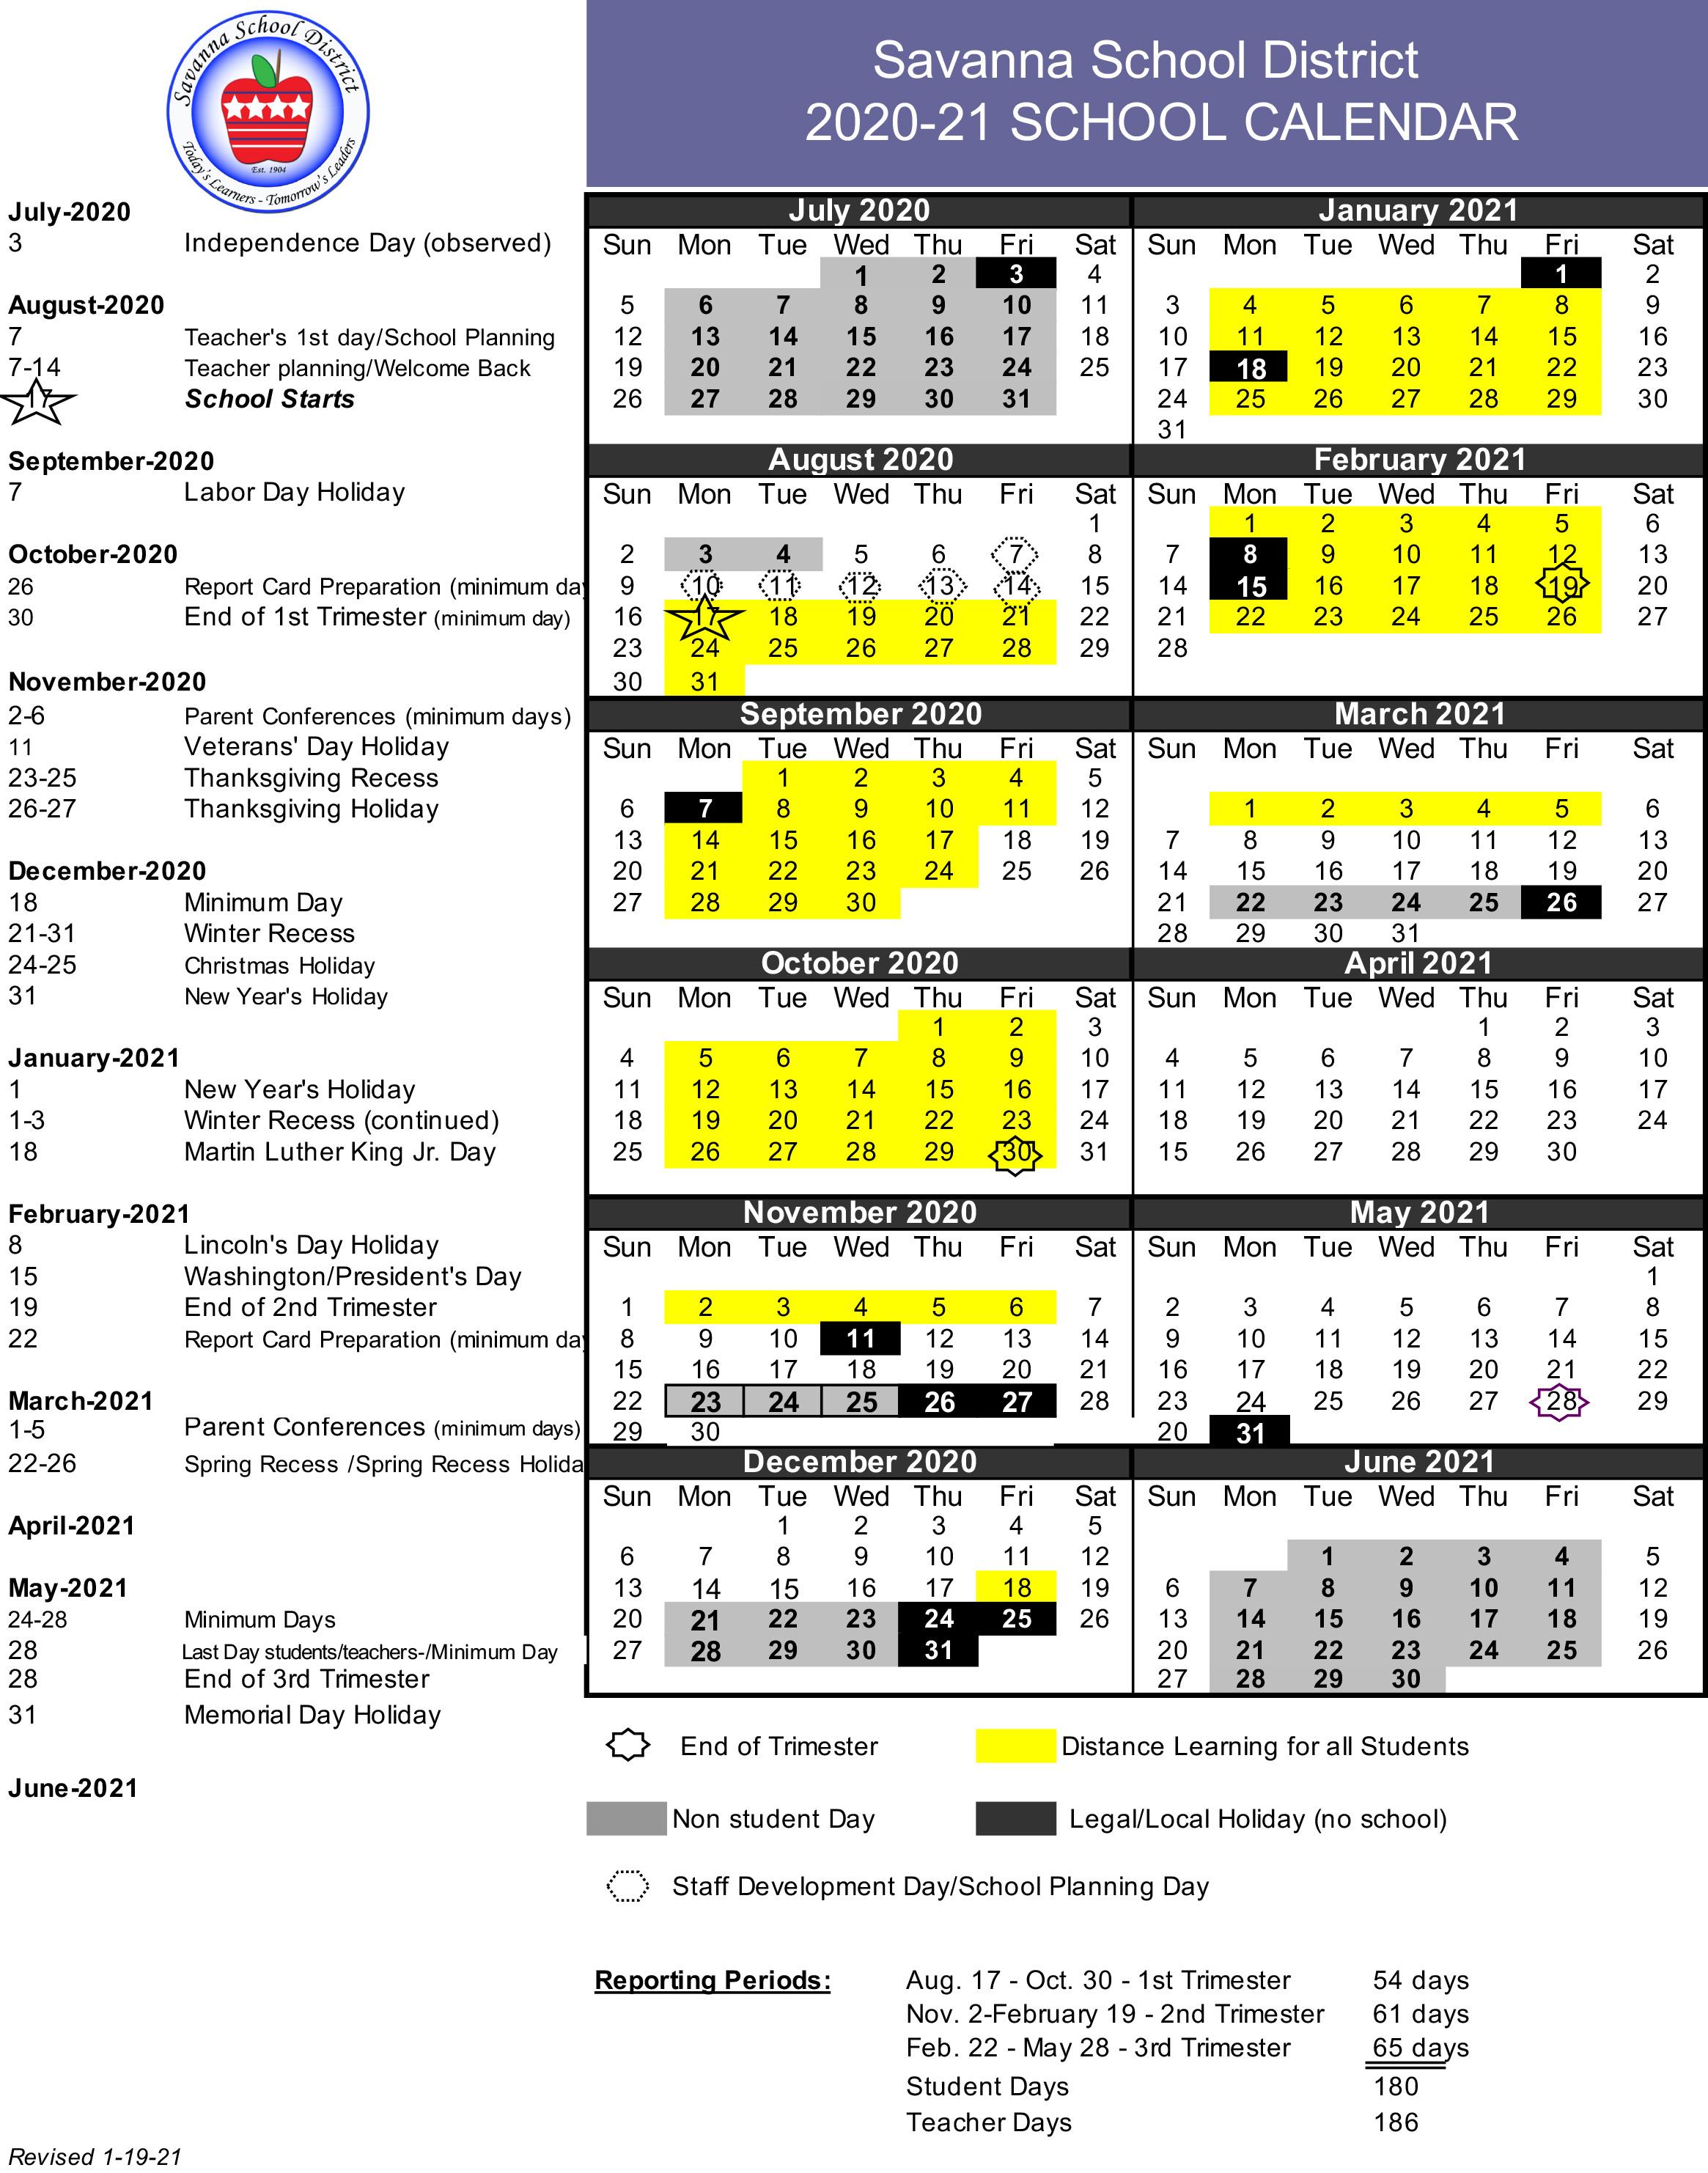 Savanna School District Academic Calendar